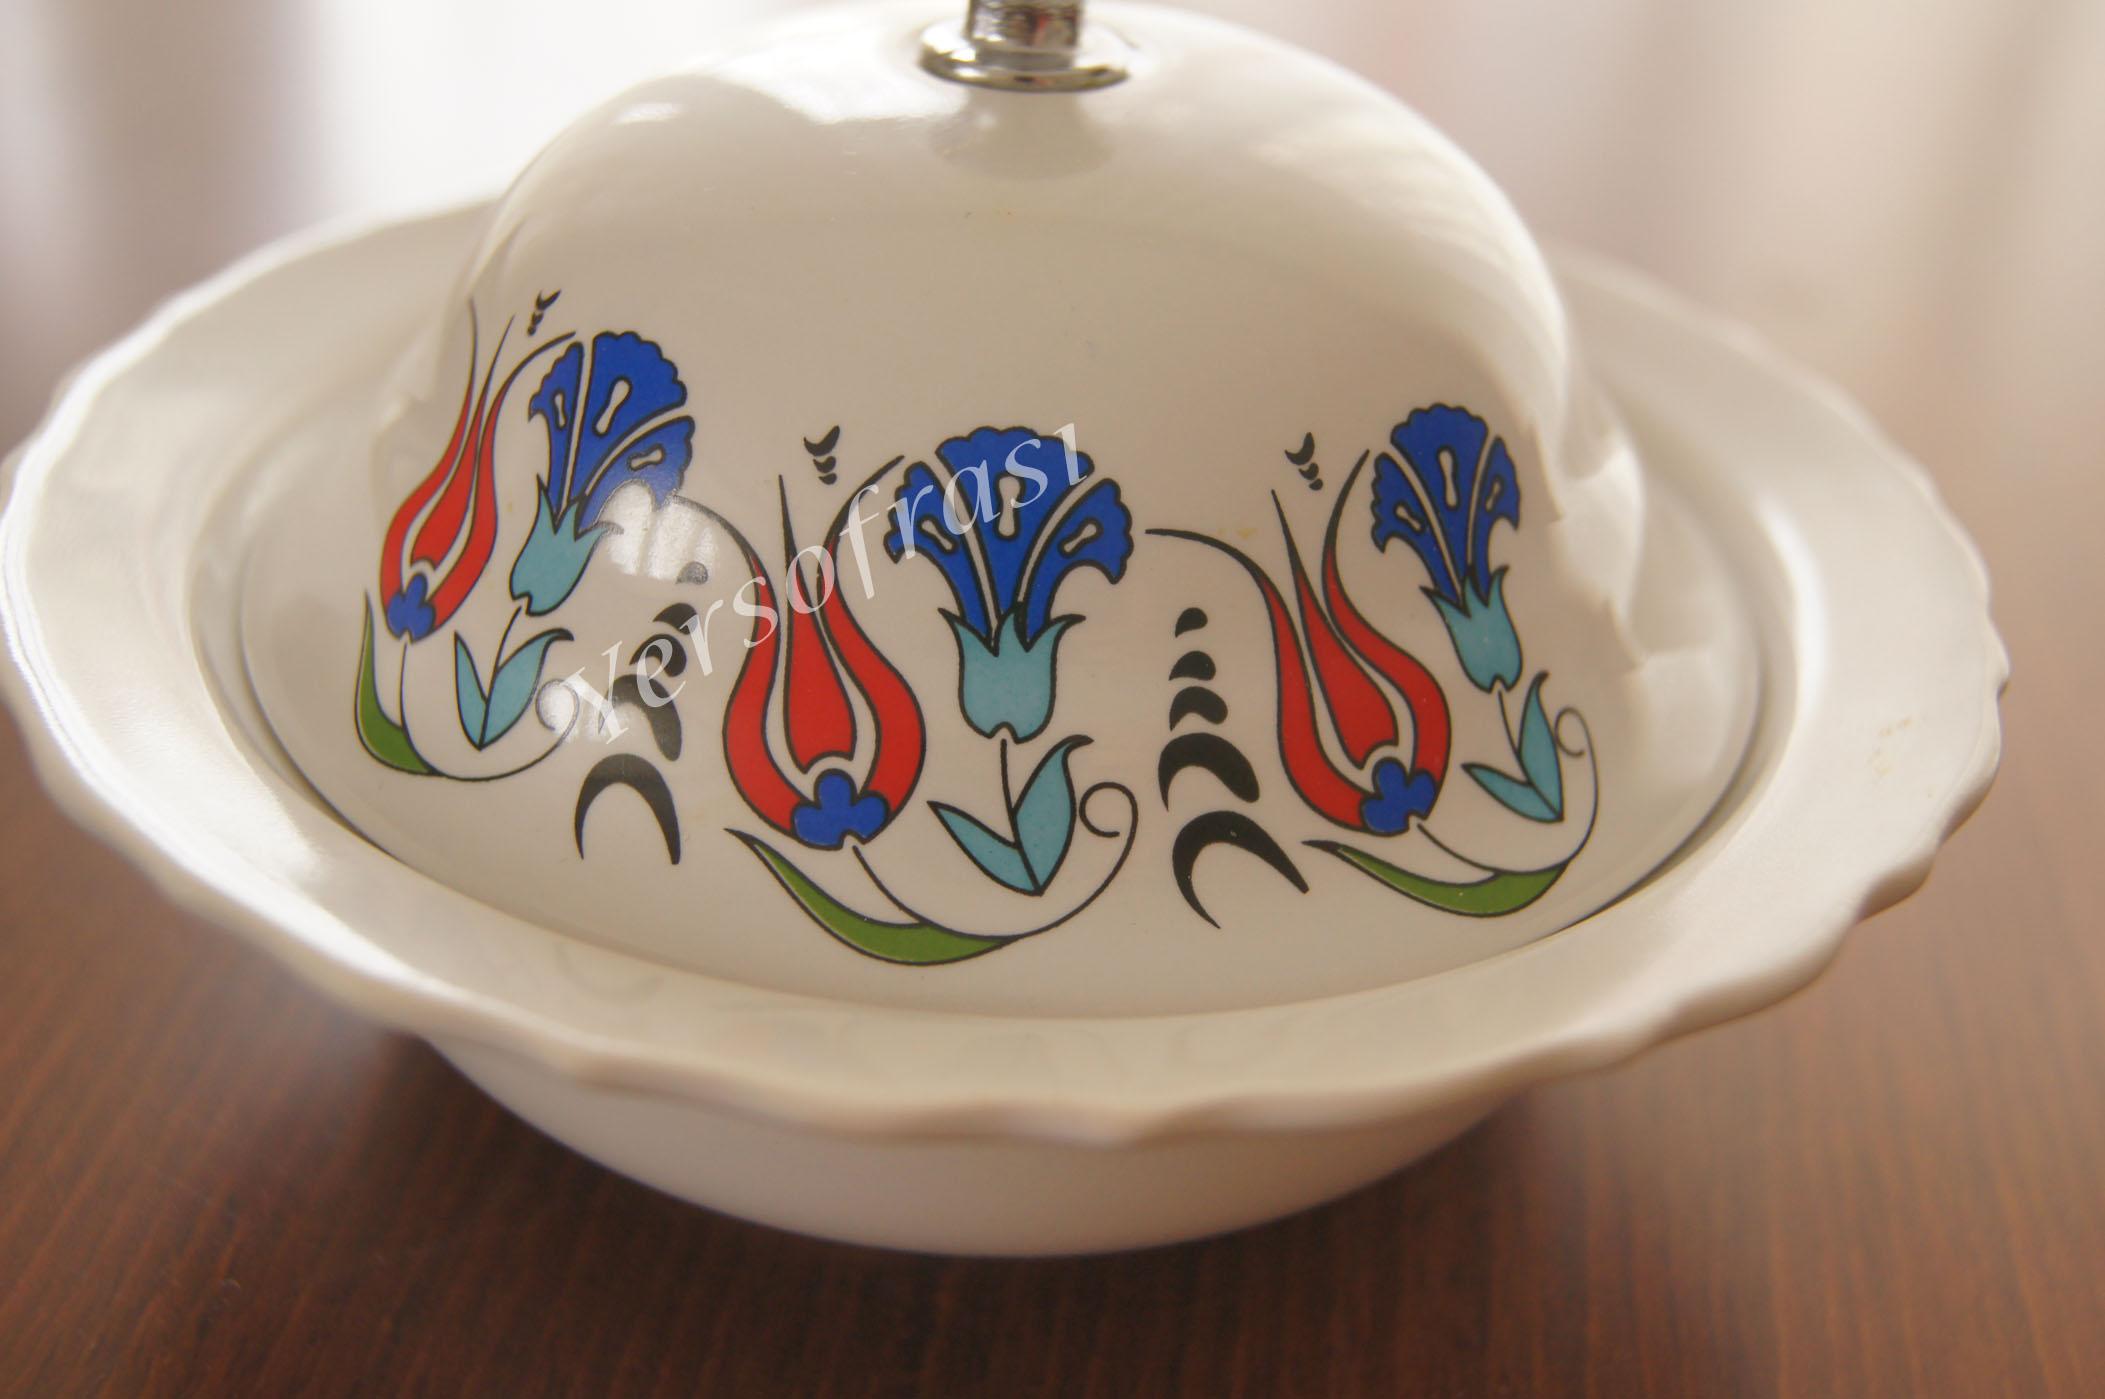 porselen sekerlik